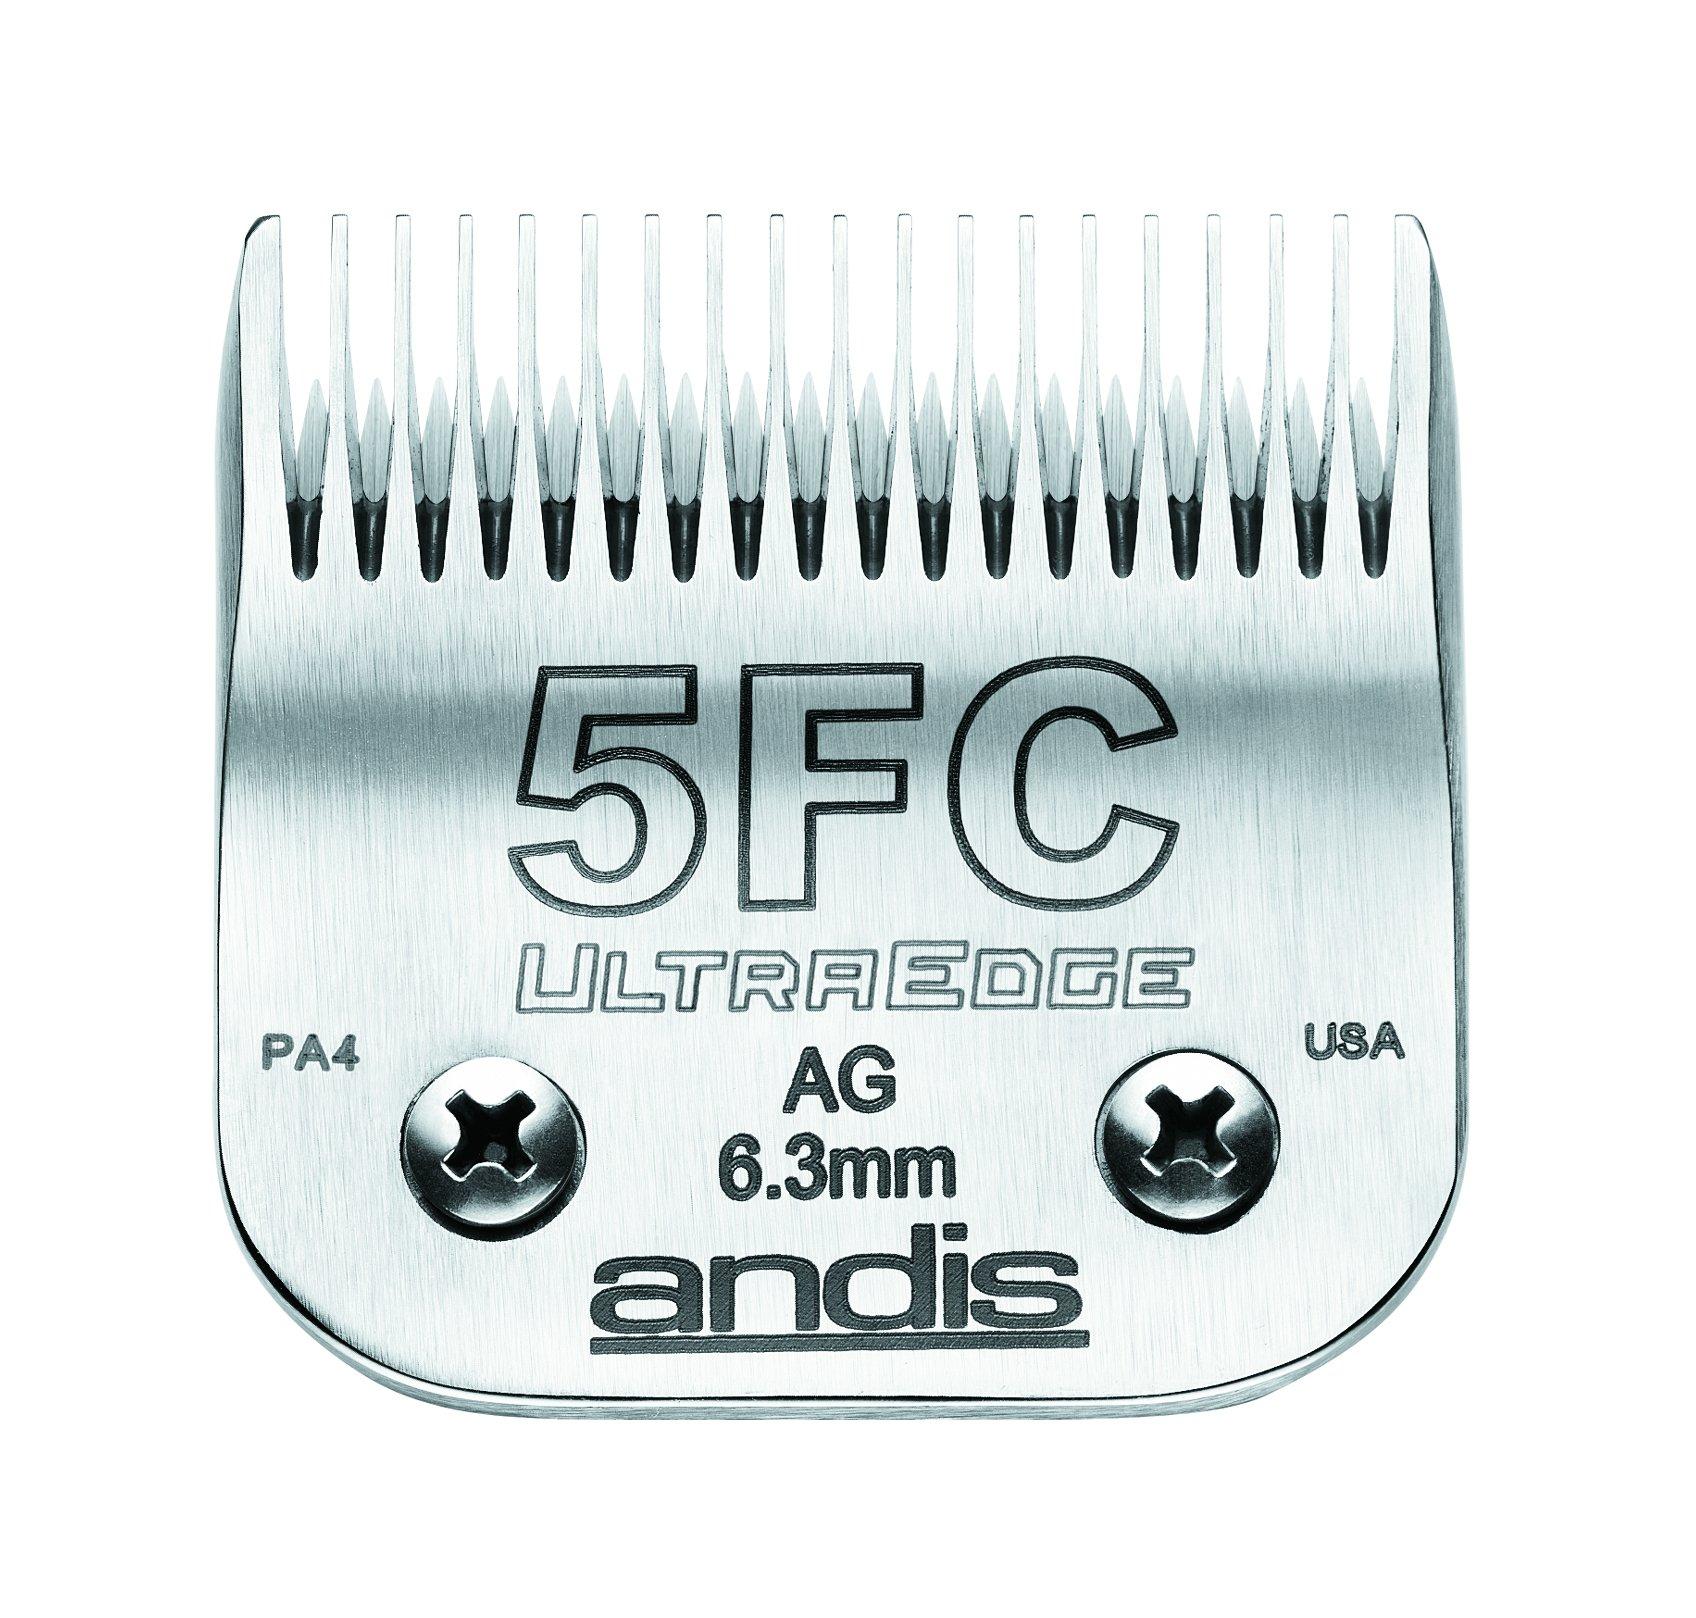 Cuchillas : Andis 5FC Ultra Edge 64122 Reemplazo